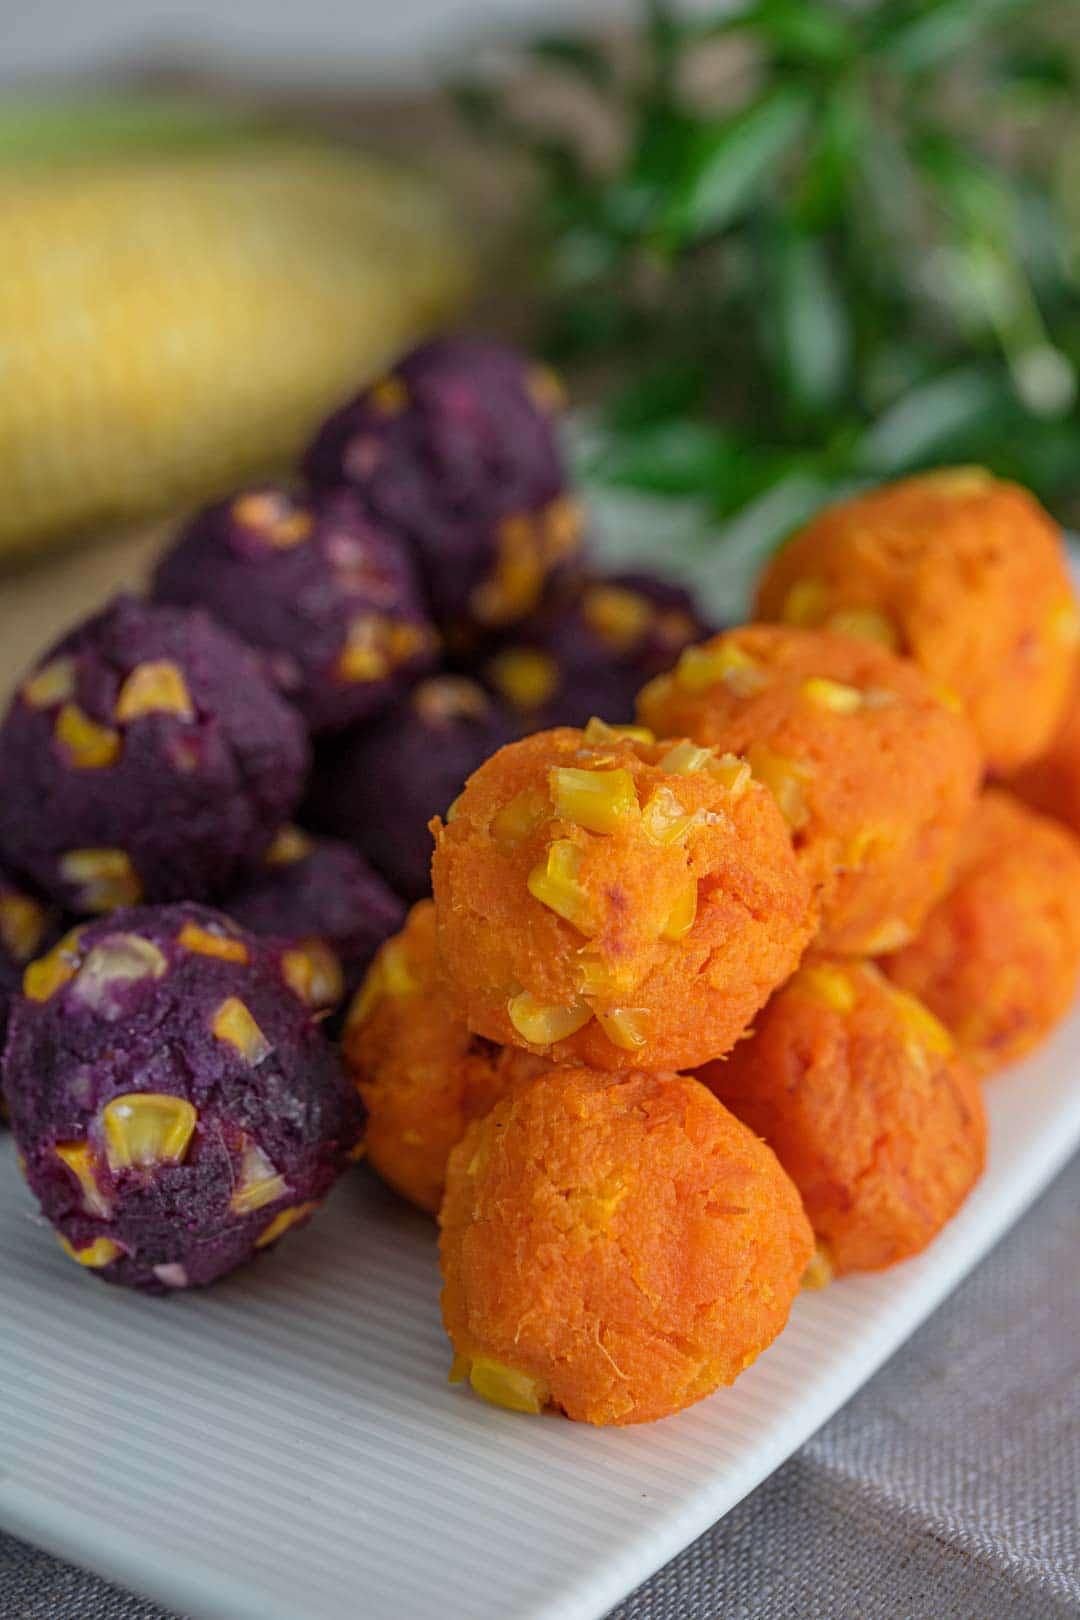 orange and purple sweet potato snack